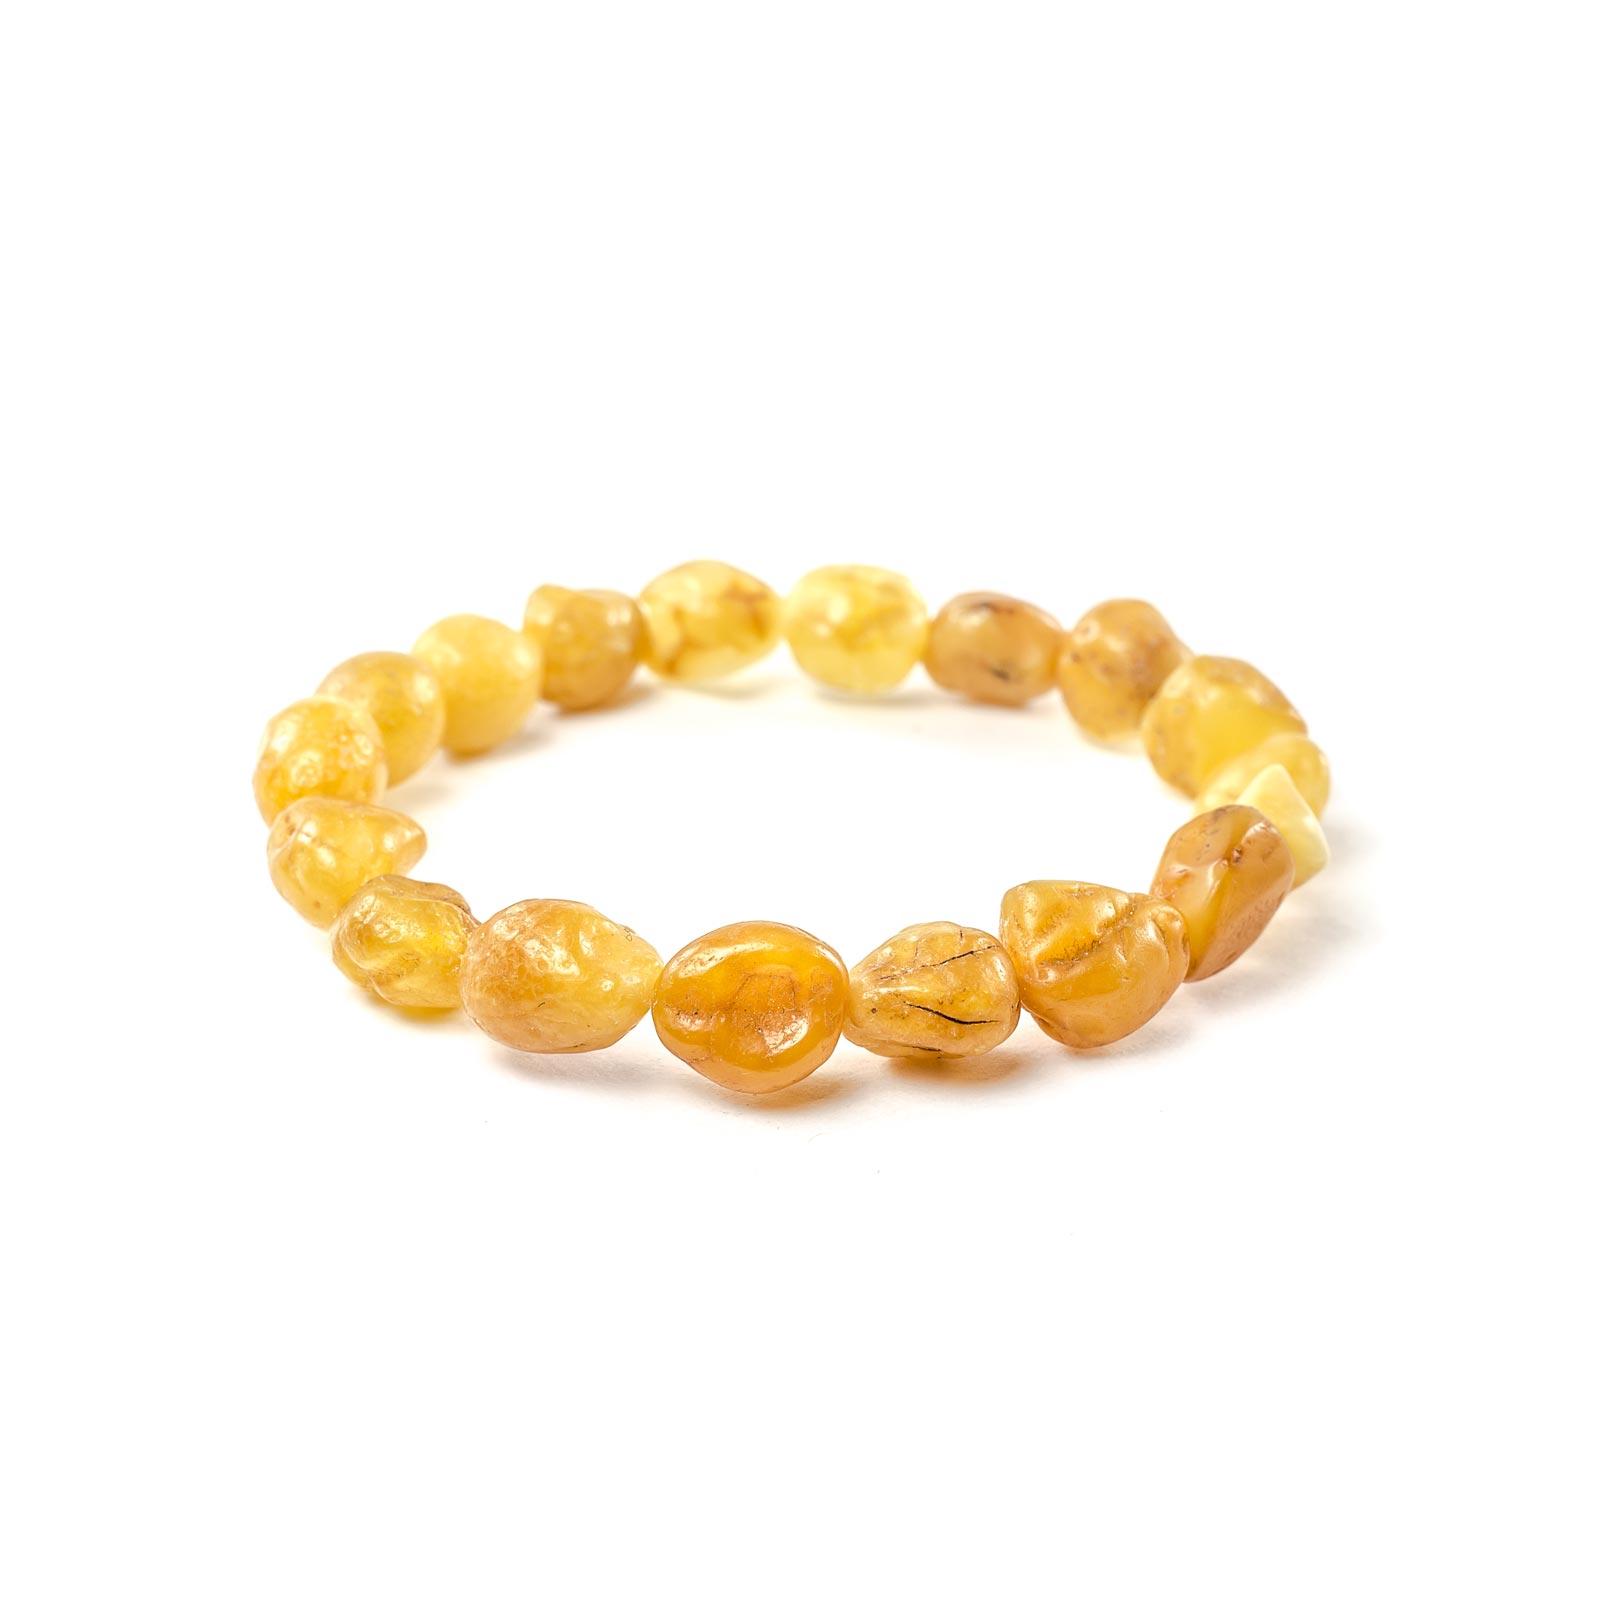 Natural Raw Baltic Amber Bracelet 'Tender'